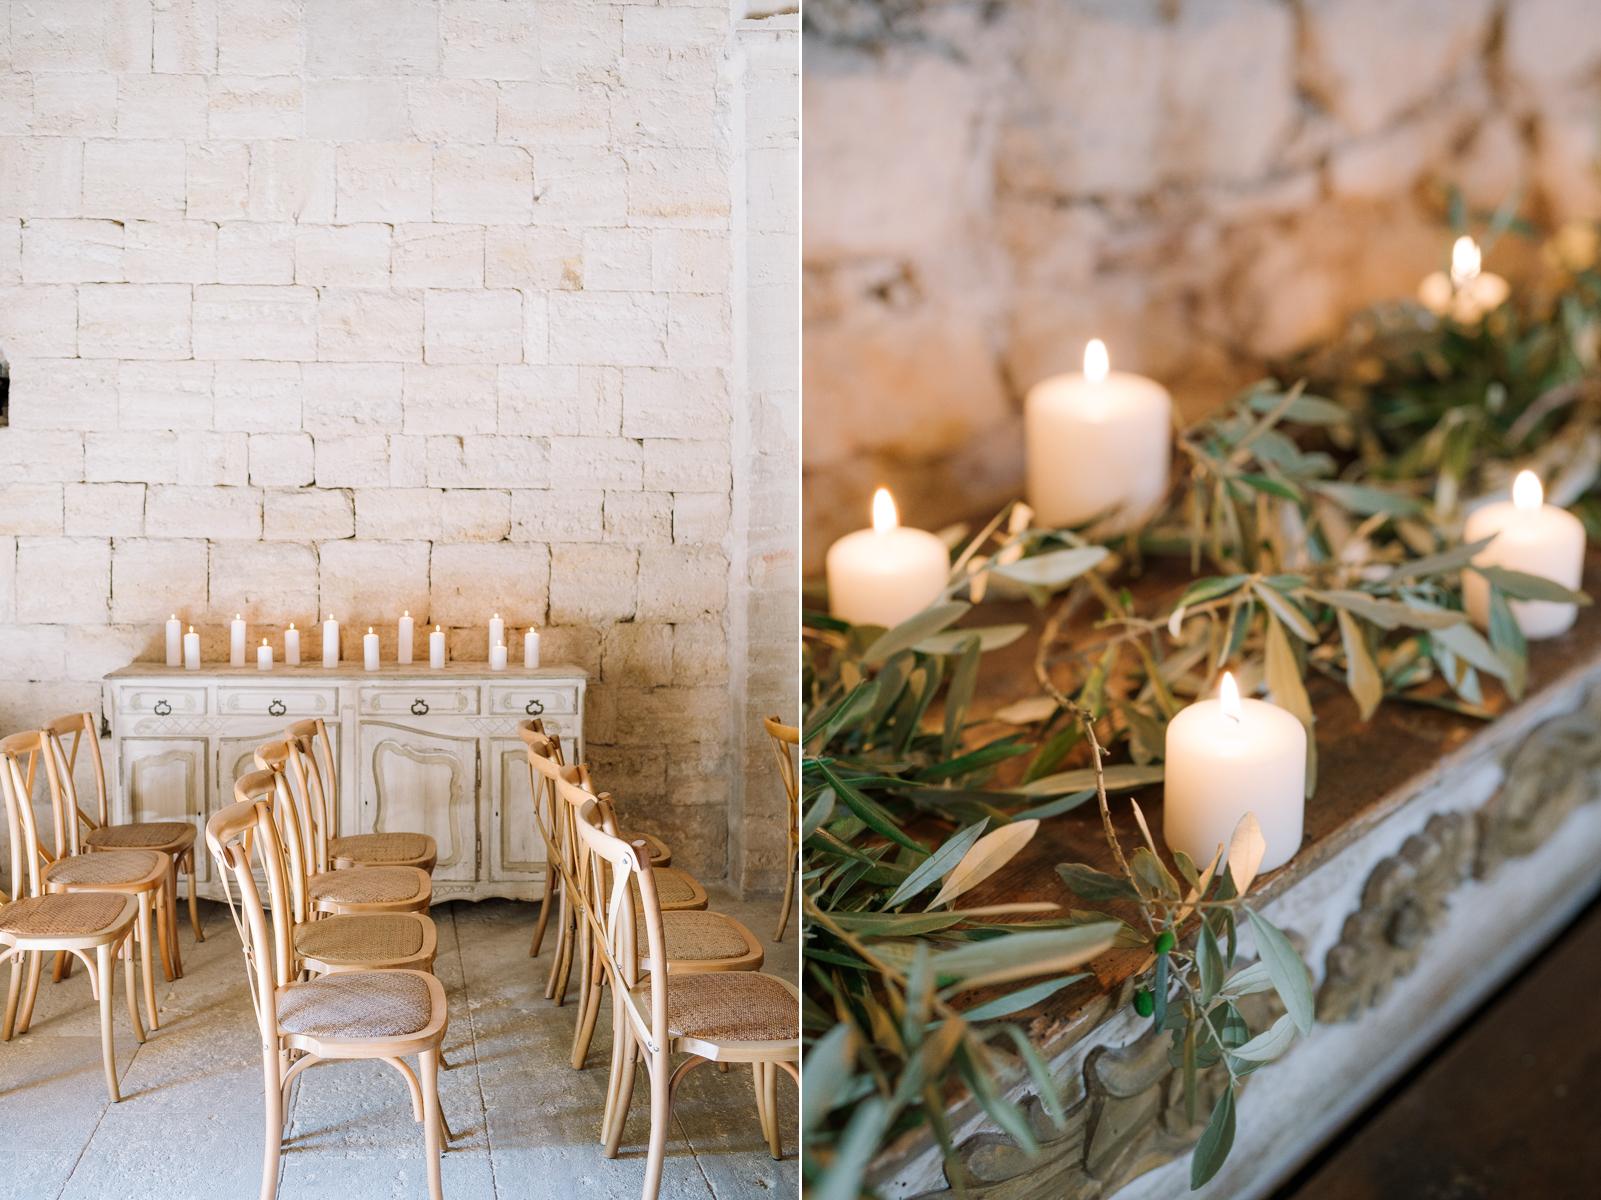 Boheme-Moon-Photography-Wedding-in-Provence-France_014.jpg